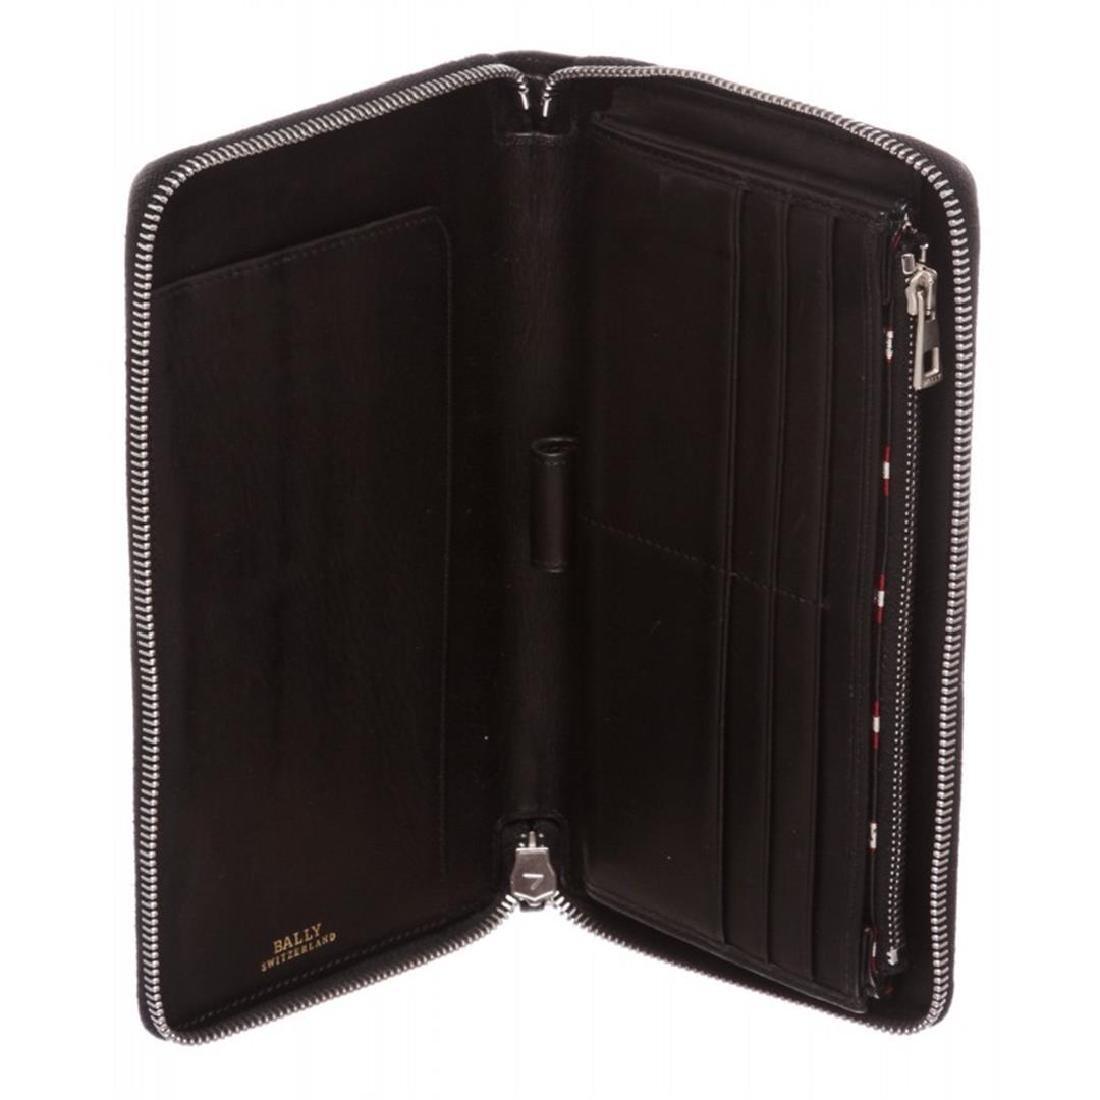 Bally Black Leather Long Zipper Wallet - 7